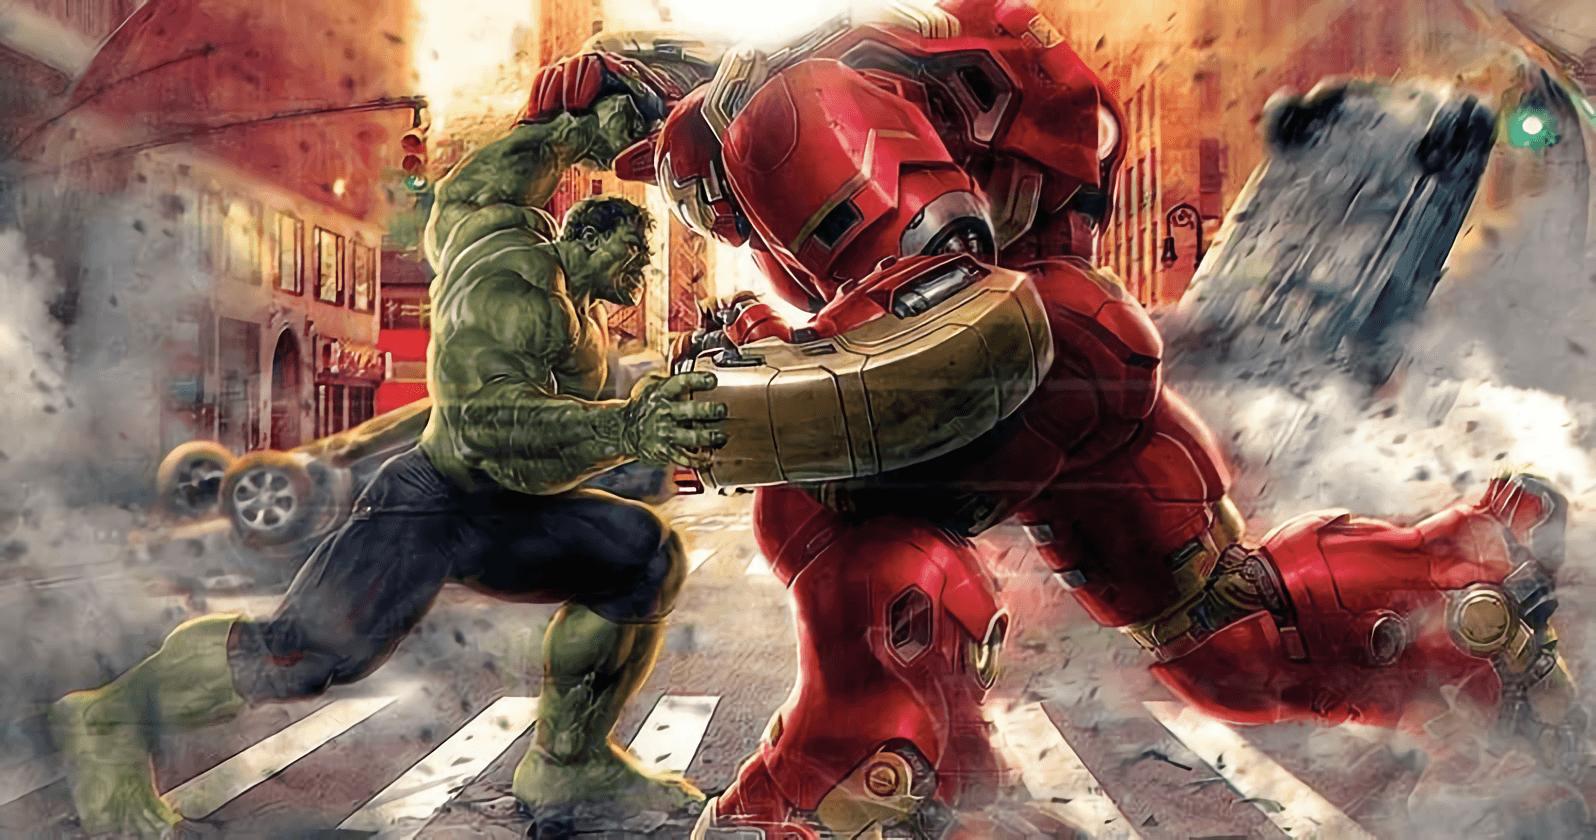 Hulk & Hulkbuster